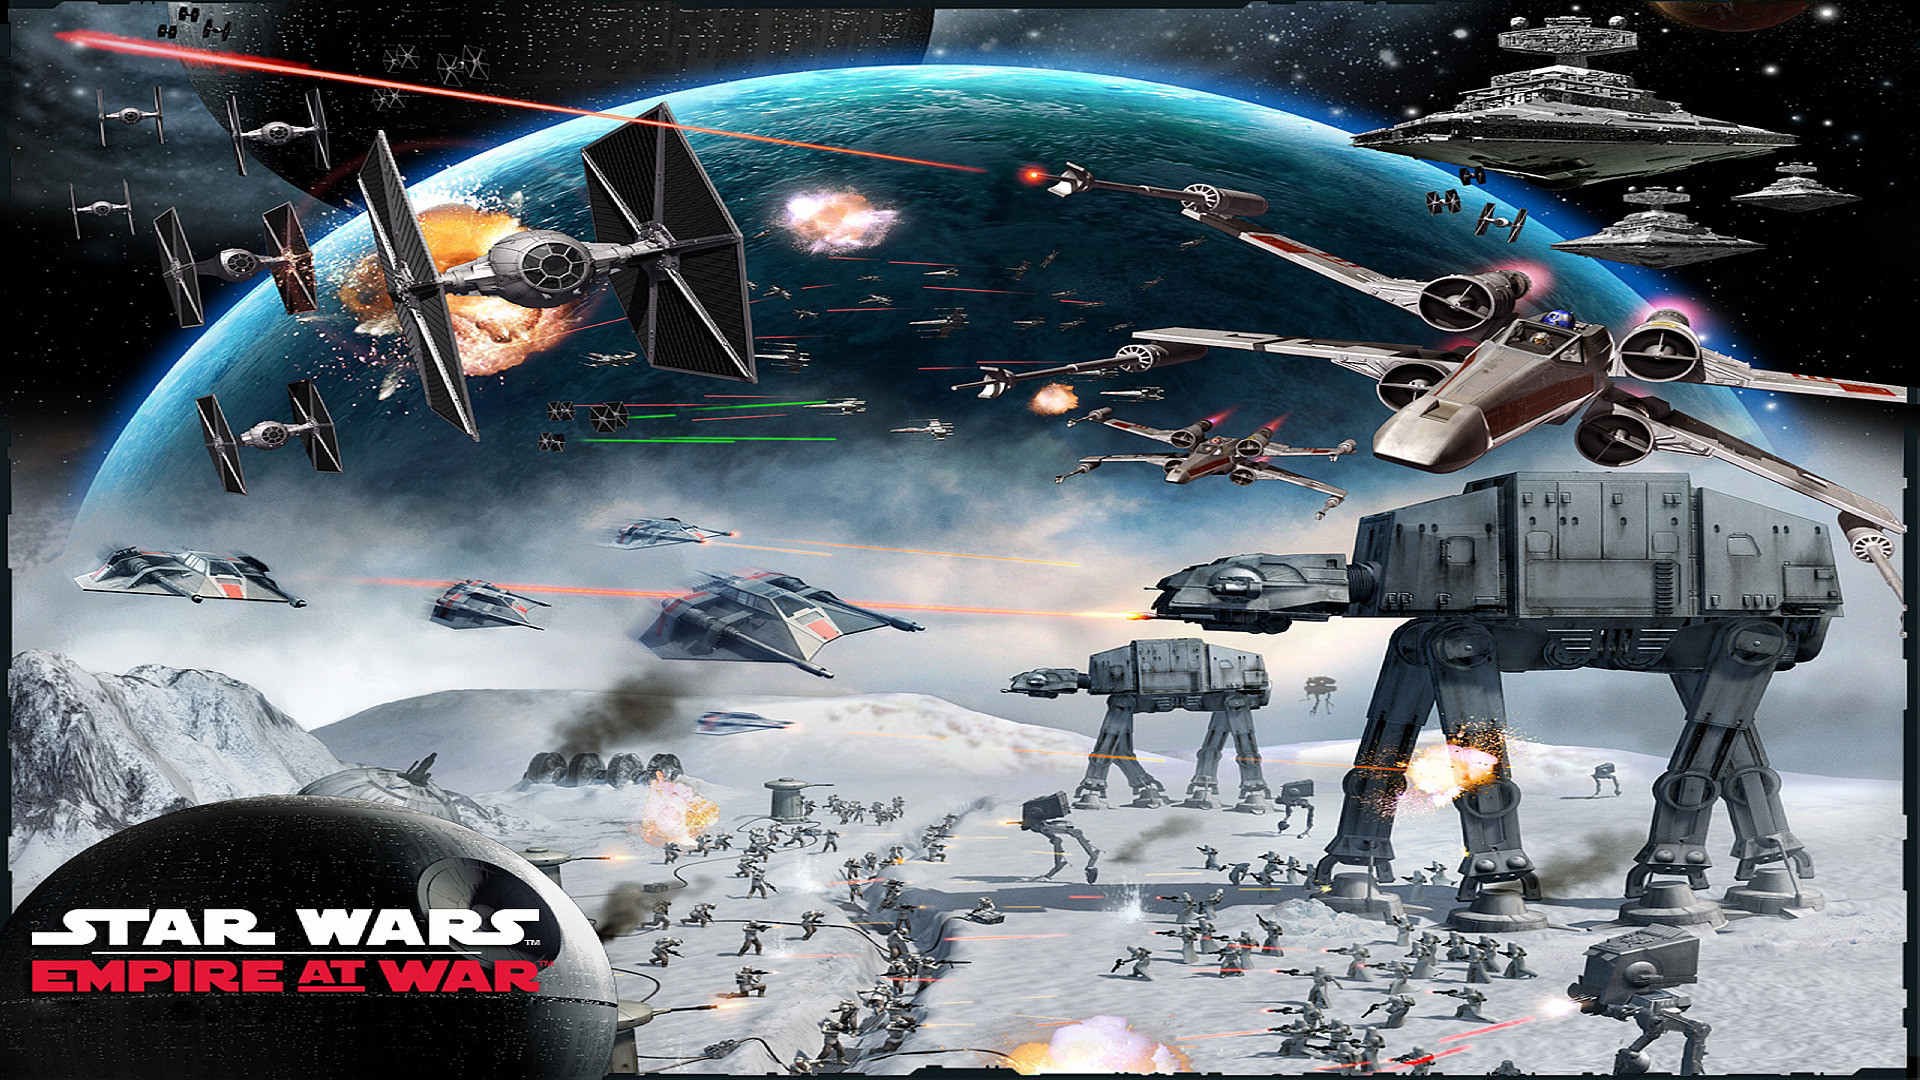 Star Wars: An Empire at War – Download